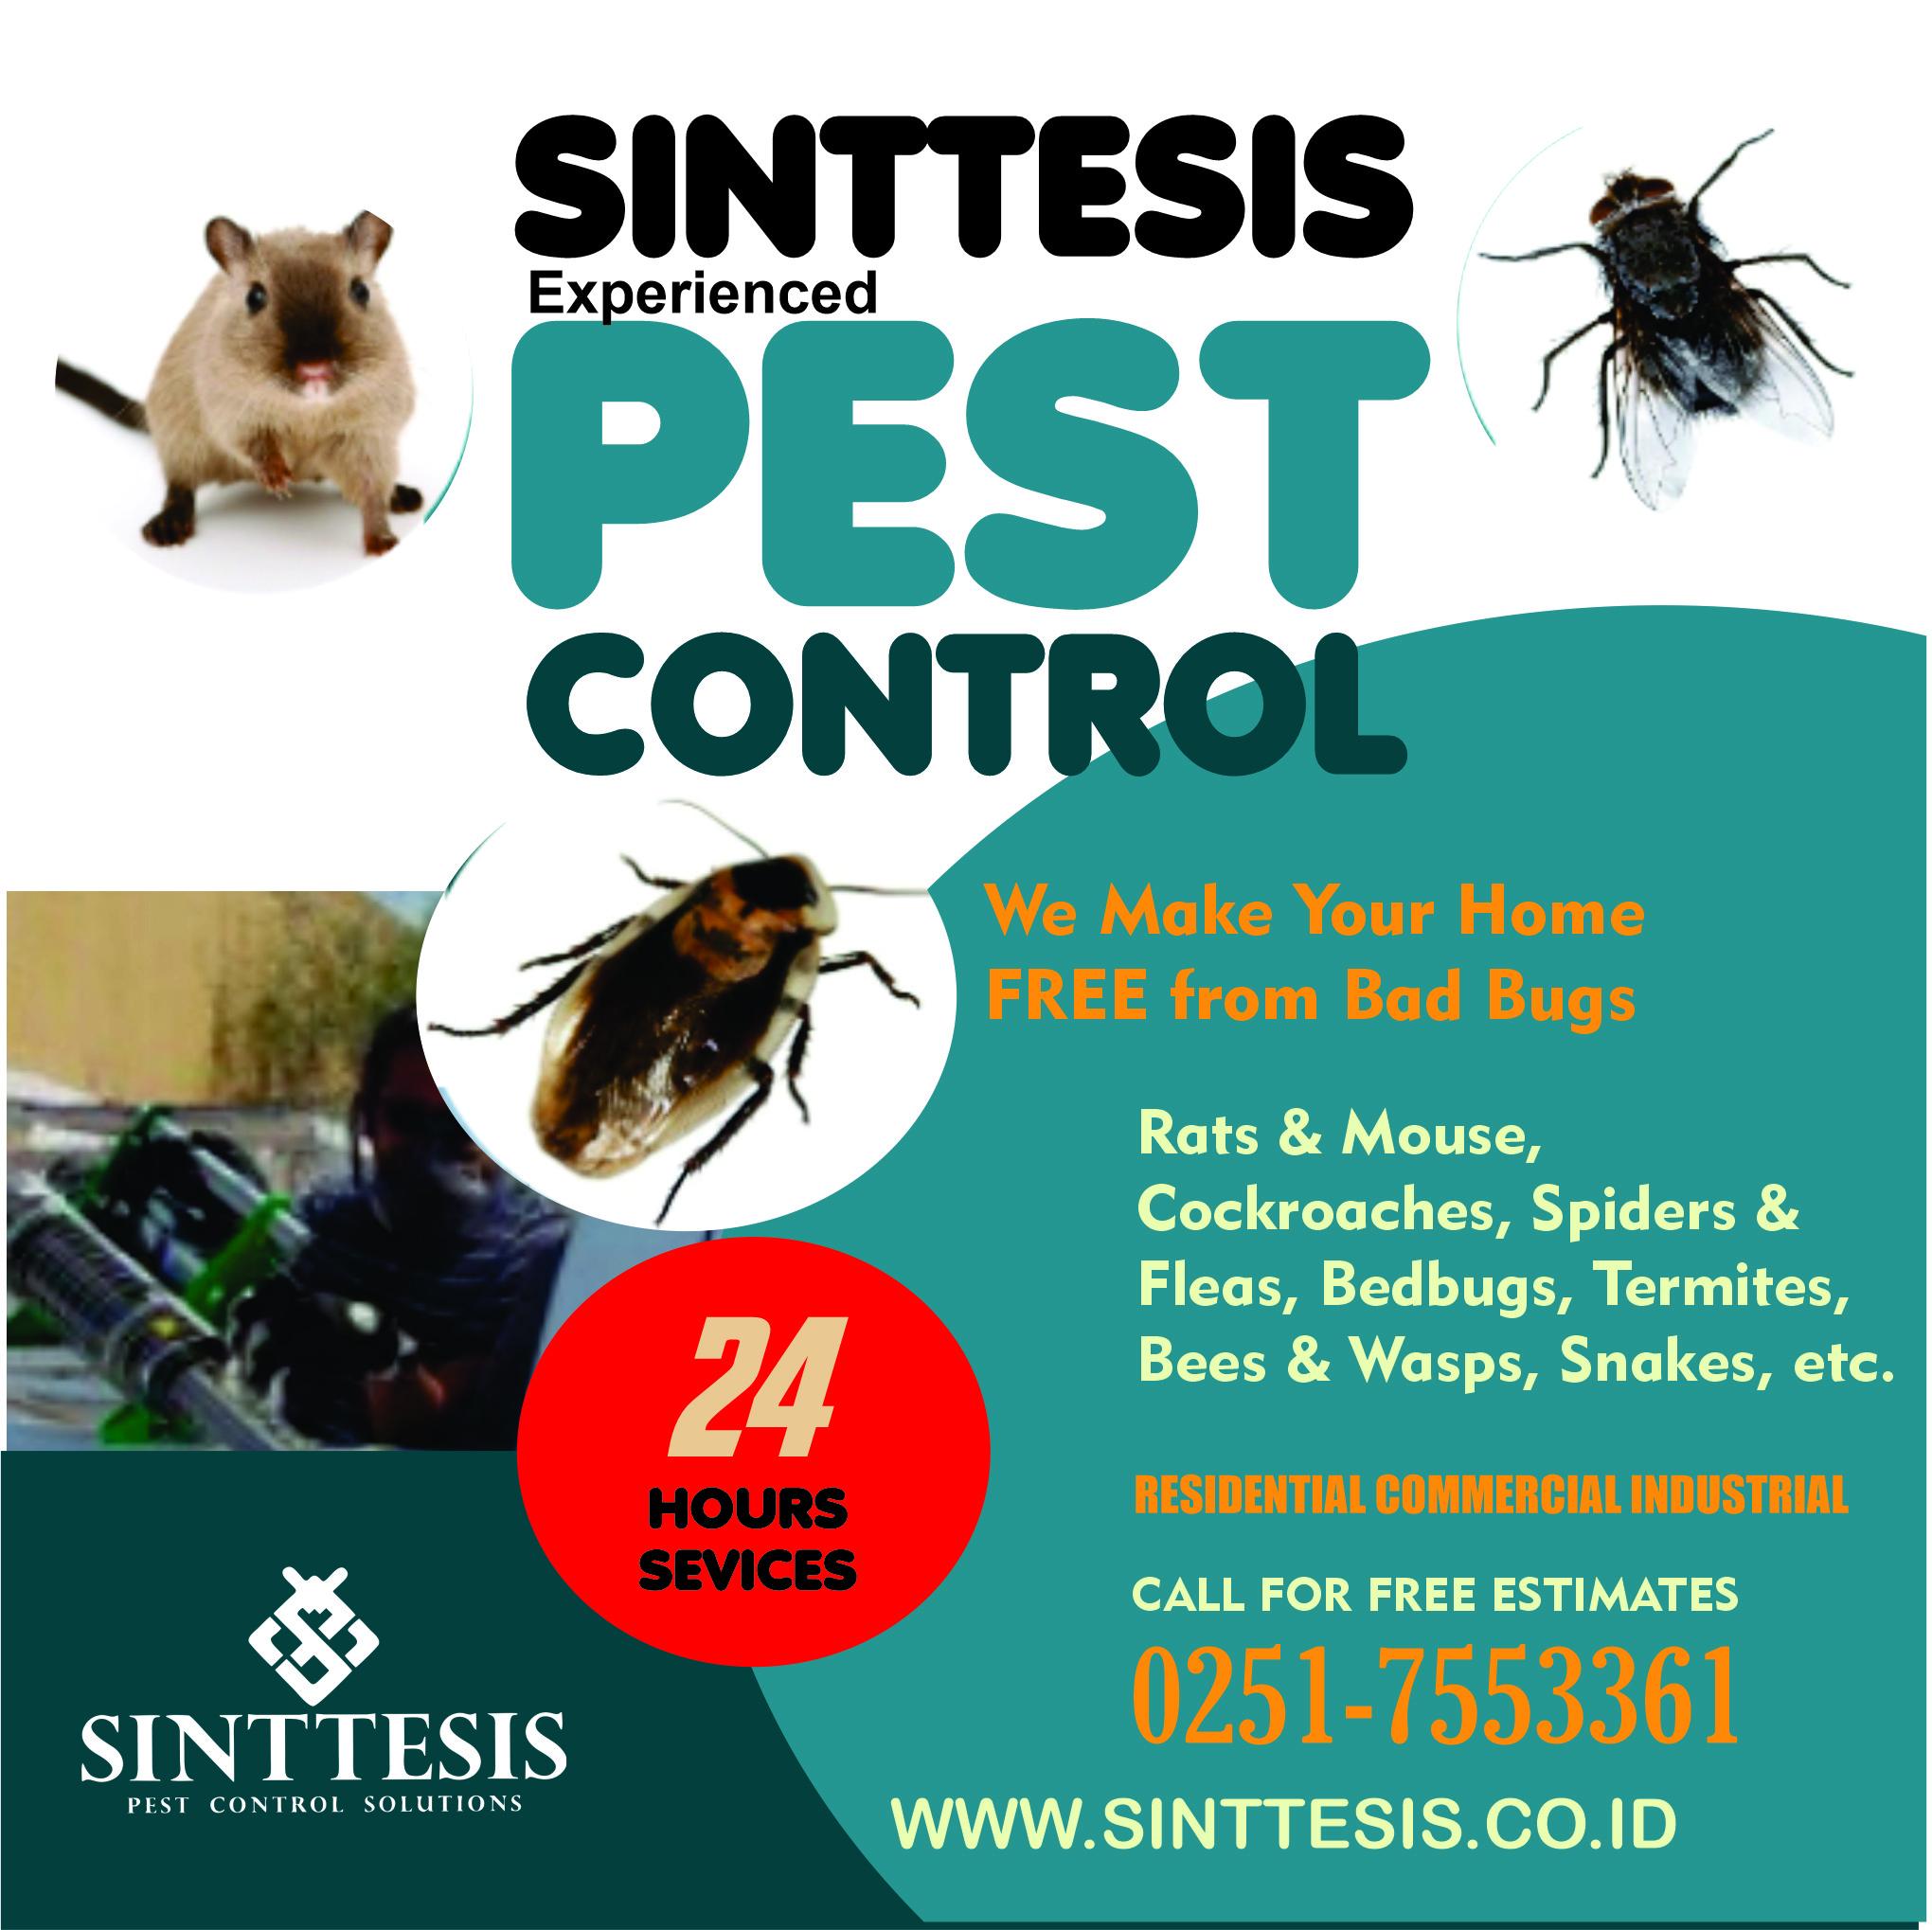 SINTTESIS PEST CONTROL